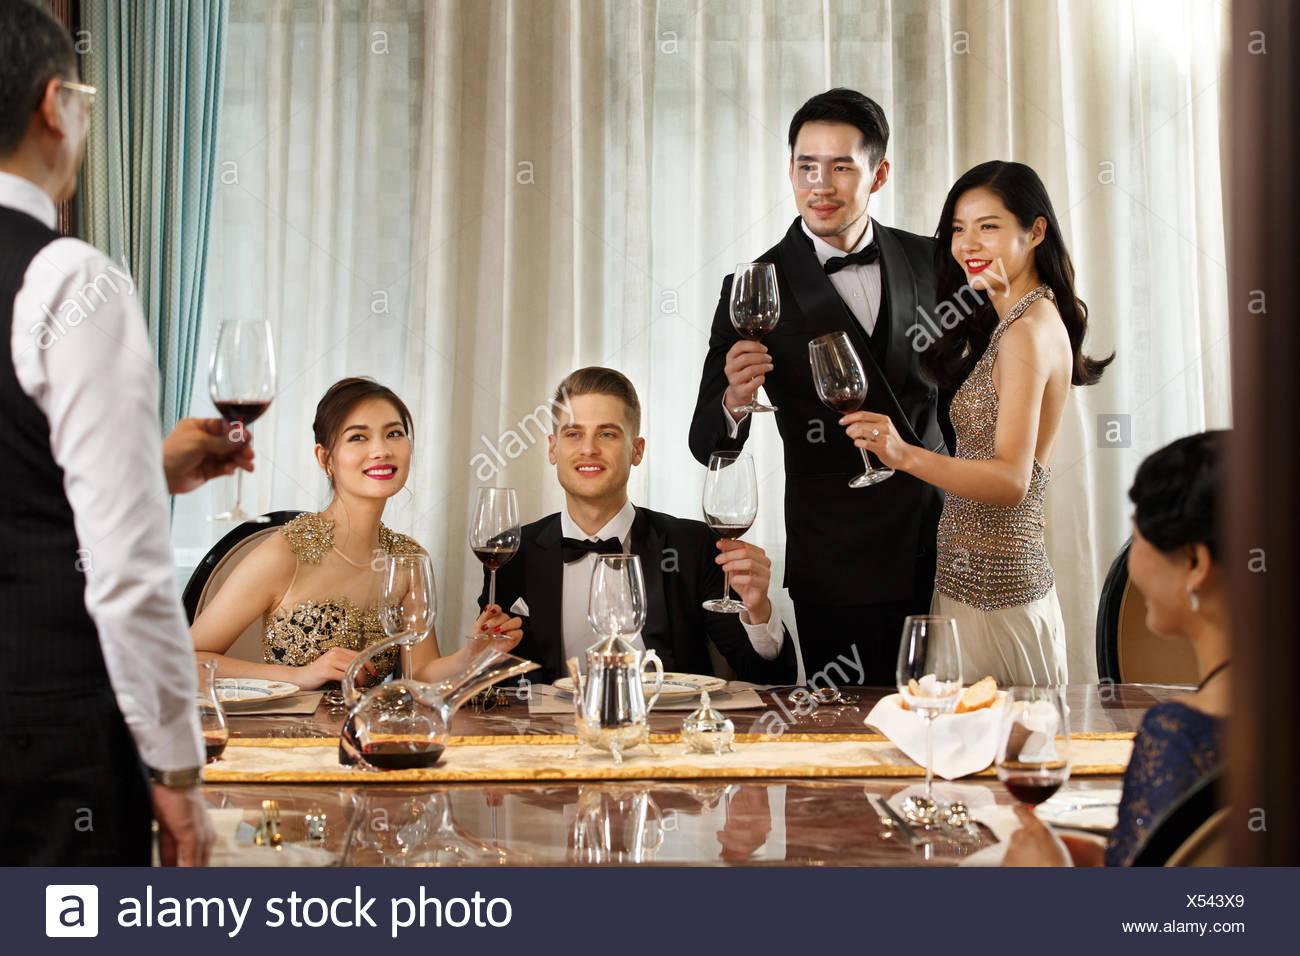 Aristocratic family dinner - Stock Image